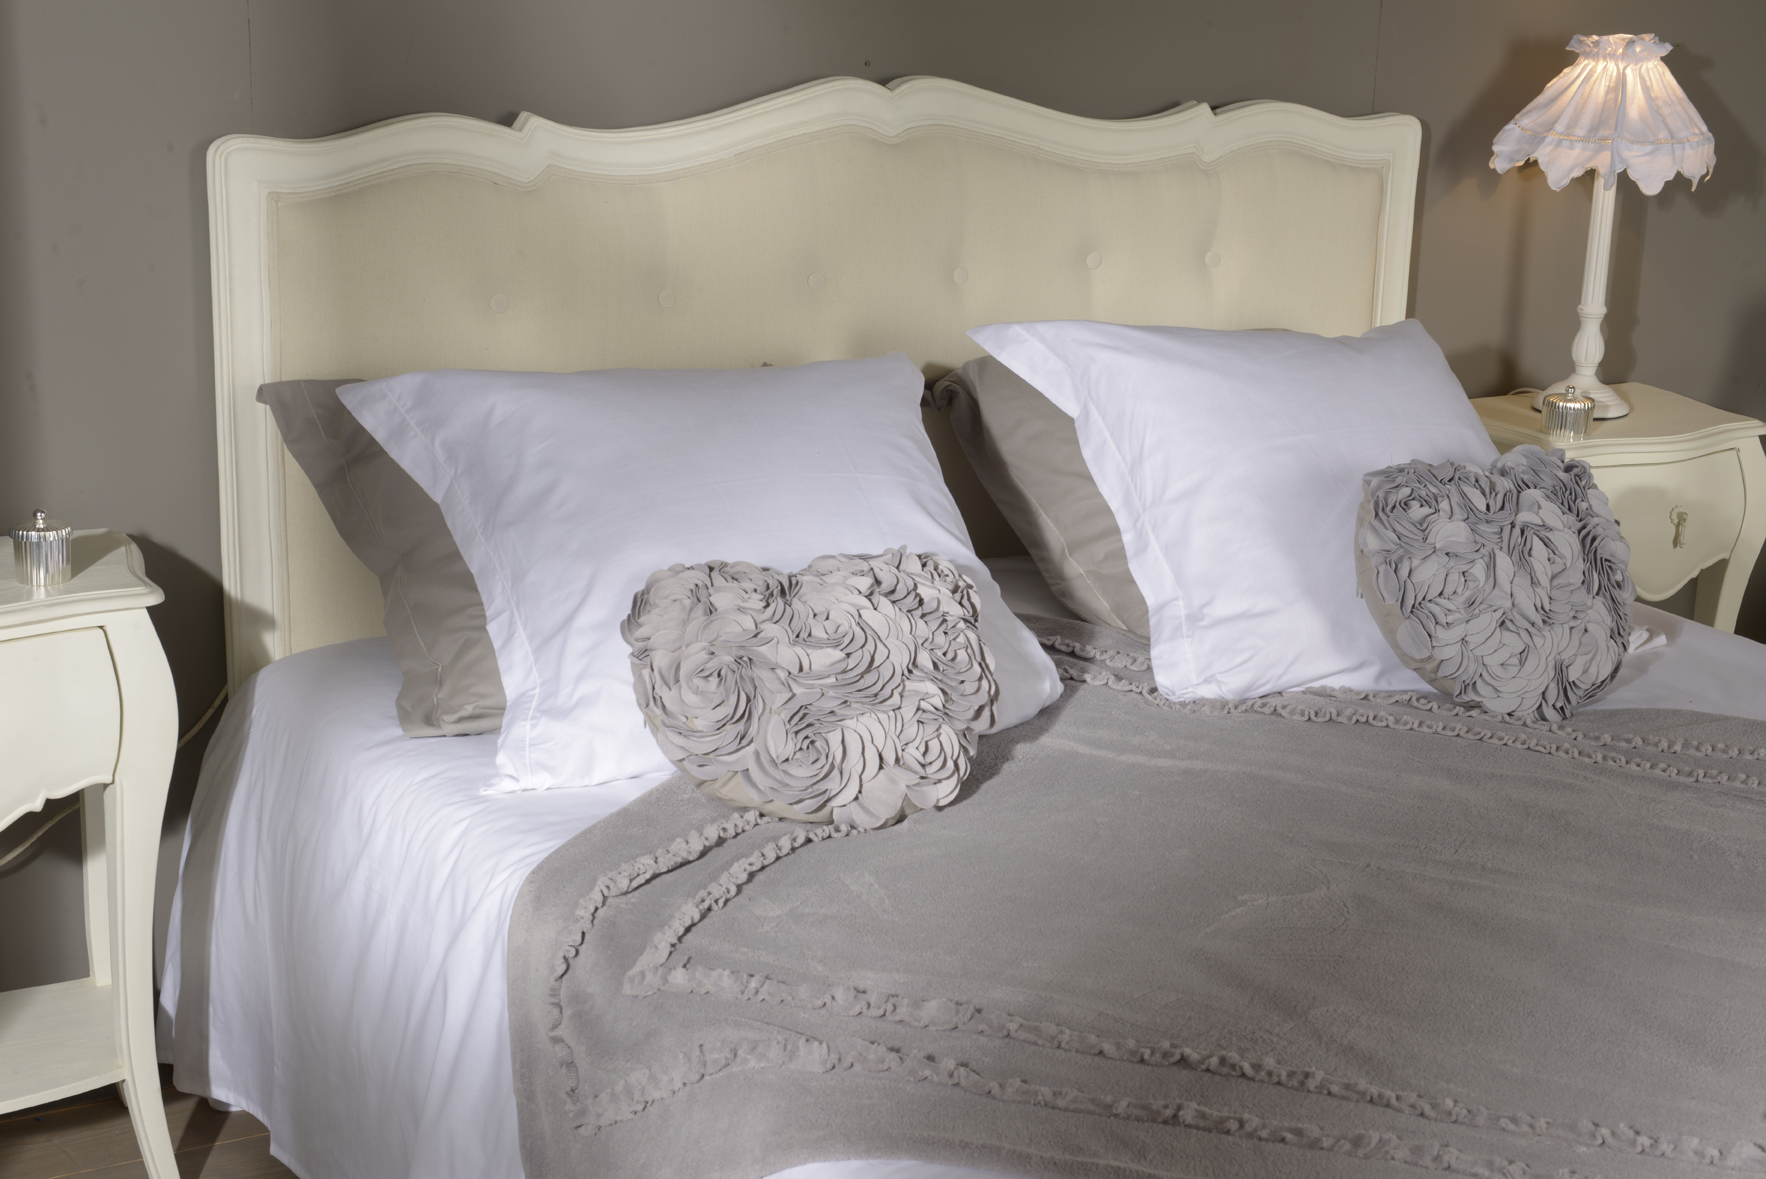 Tete de lit murano creme antique 160 amadeus 064737 d for Testate letto matrimoniale amazon